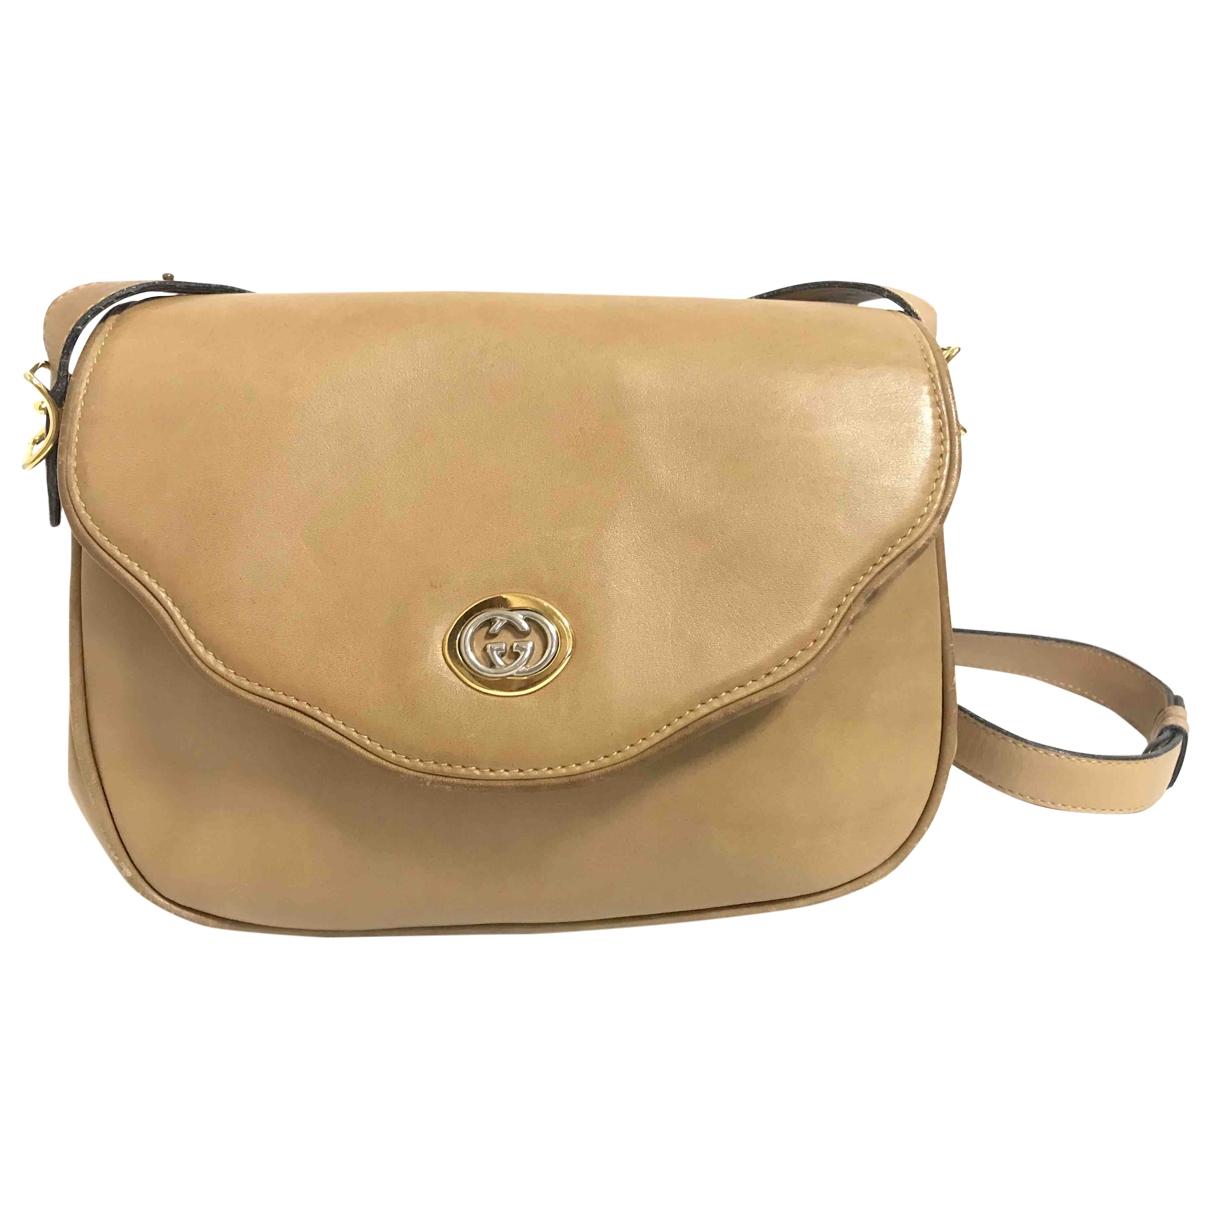 Gucci \N Brown Leather handbag for Women \N